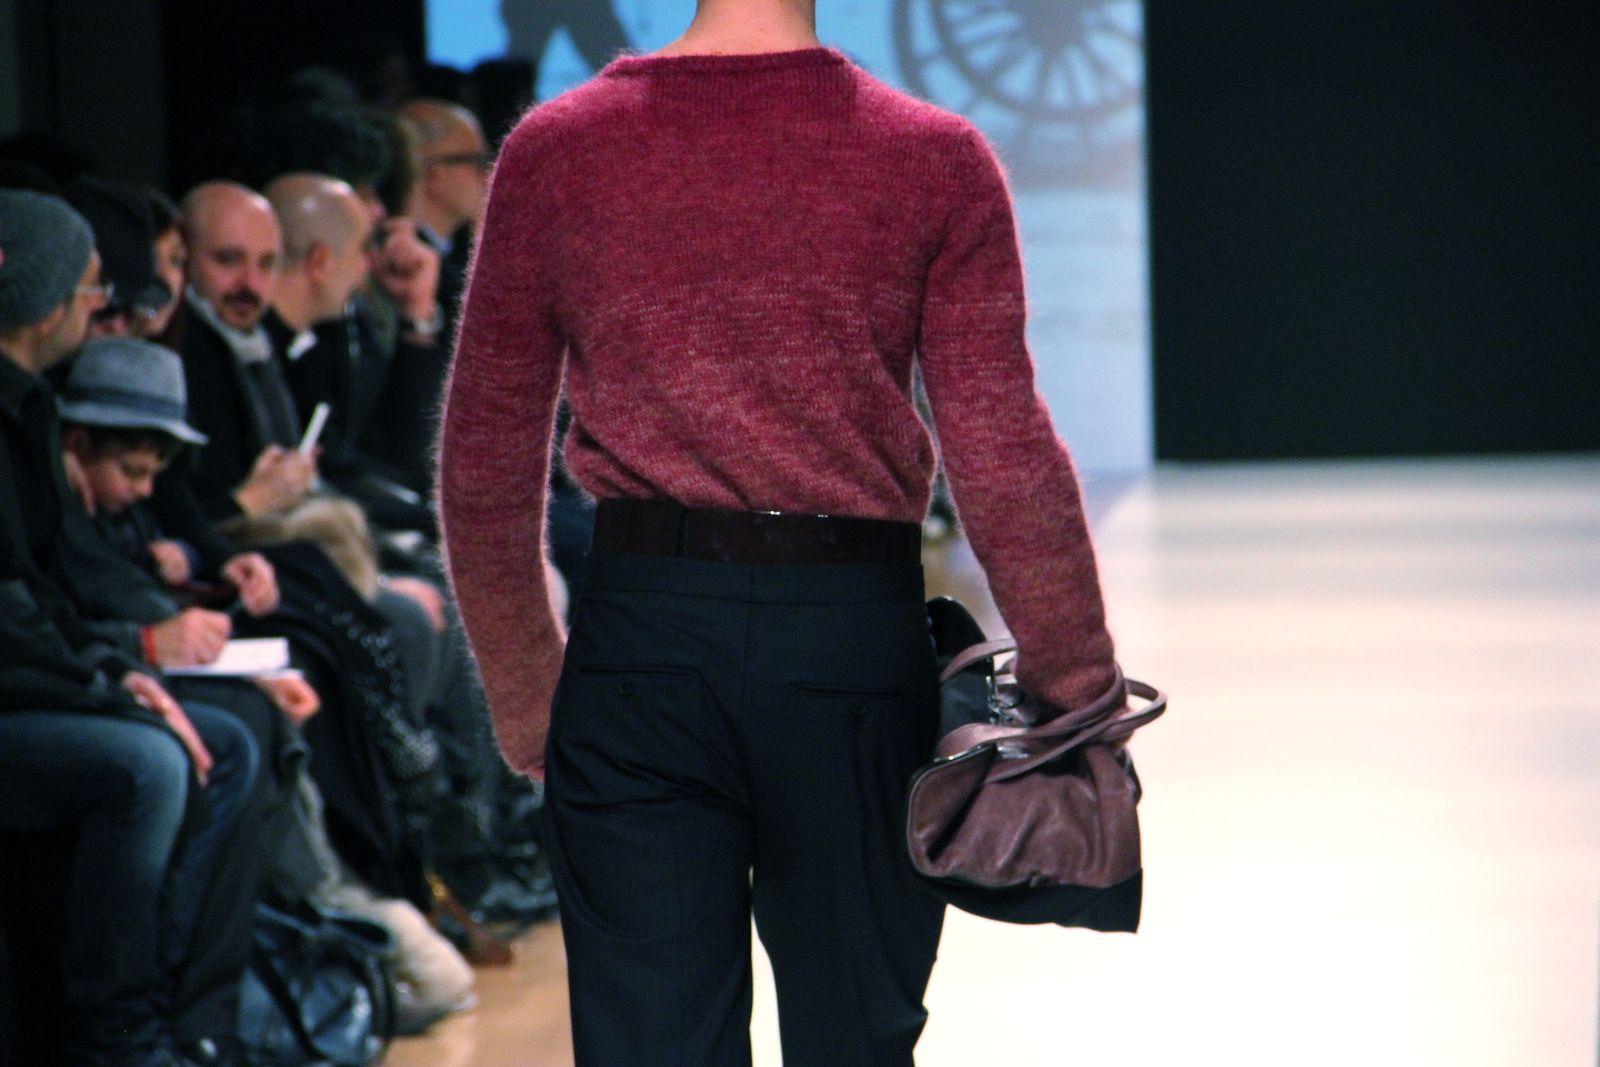 Catwalk Gazzarrini Fall Winter 2012-13 Men Fashion Show